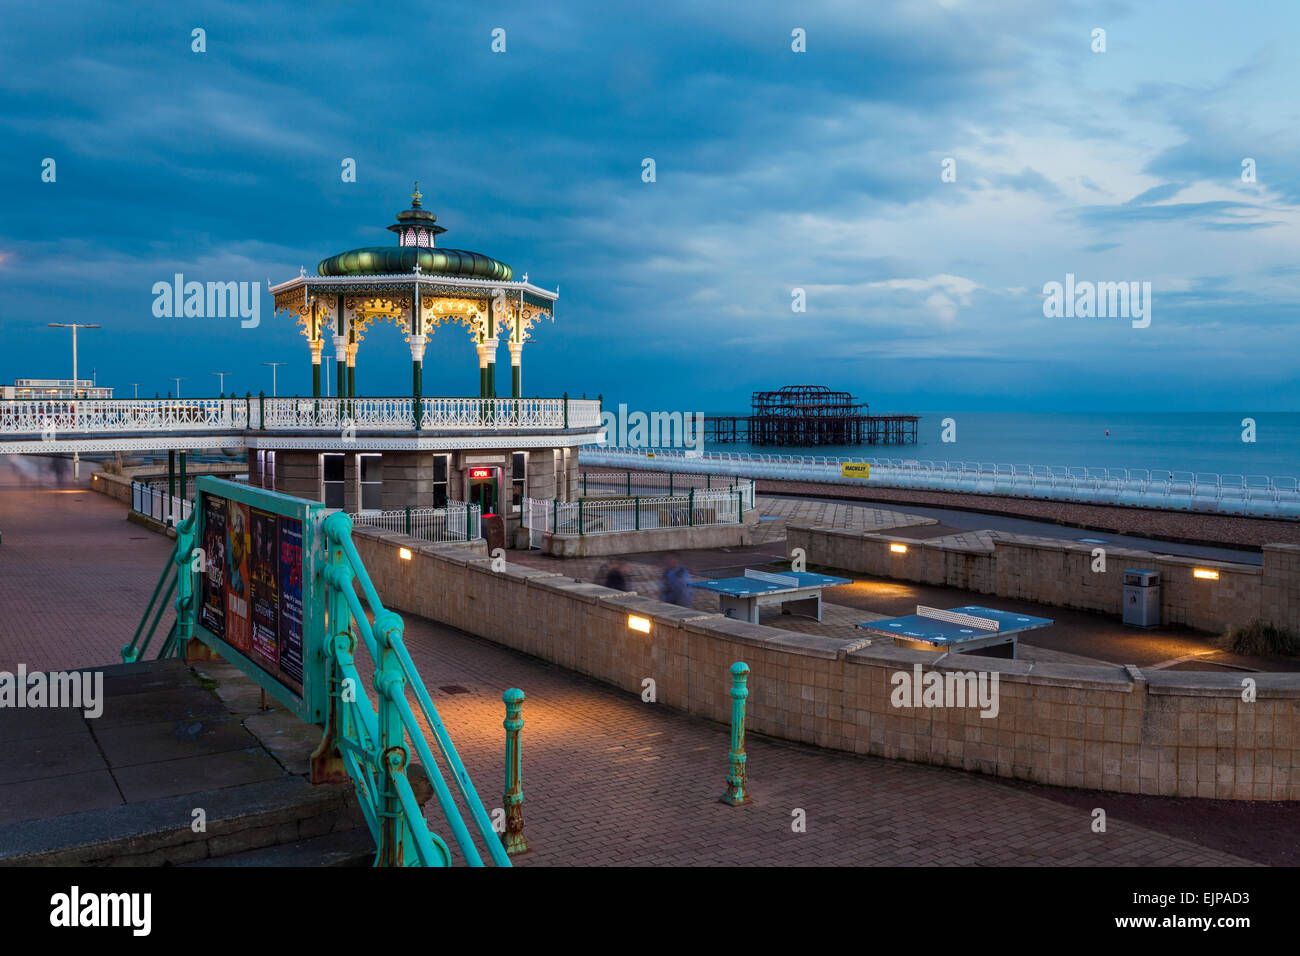 Serata sul lungomare di Brighton, East Sussex, Inghilterra. Immagini Stock